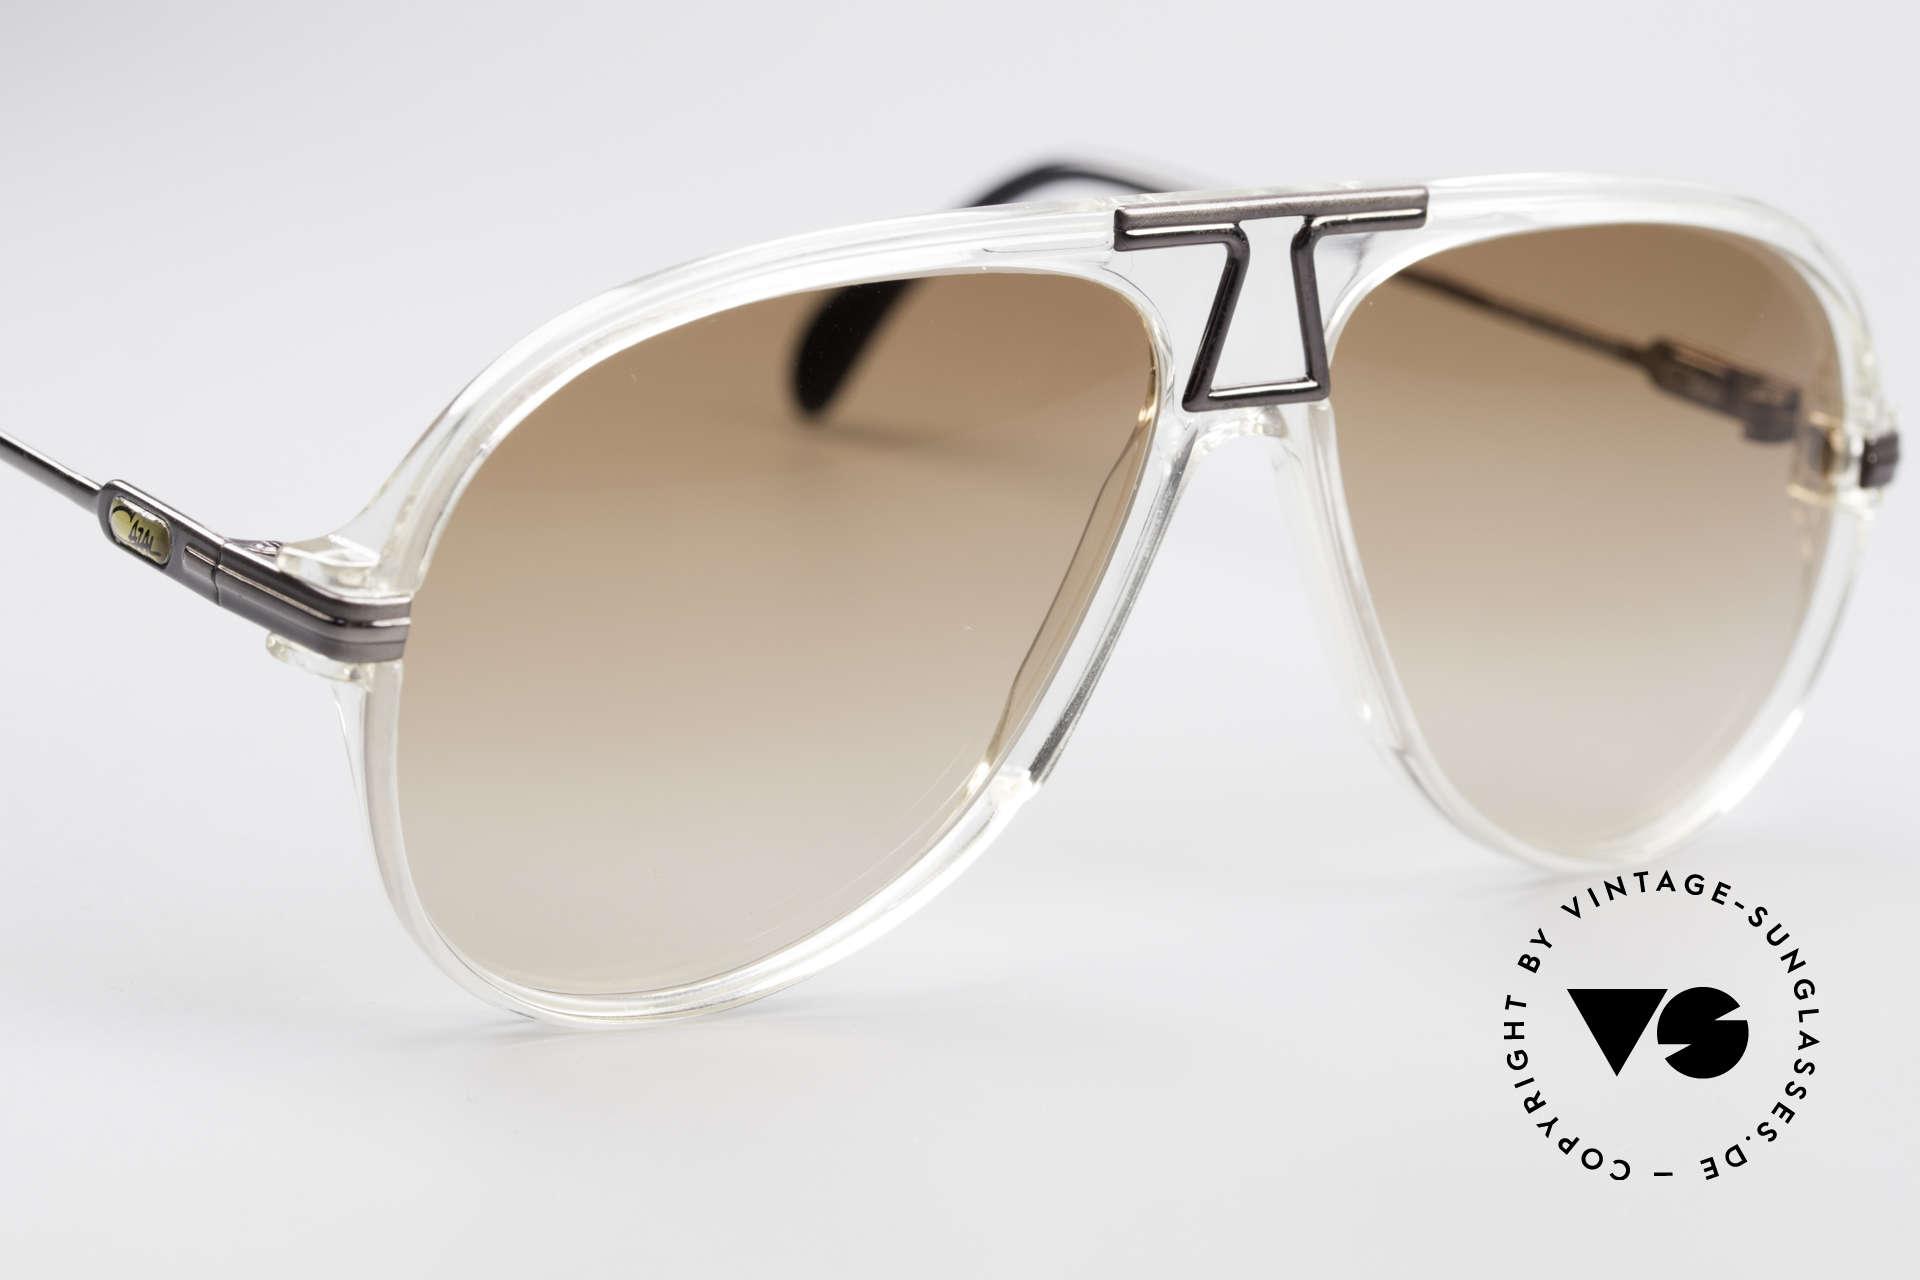 Cazal 622 Vintage 80's Aviator Sunglasses, NO retro fashion, but a 30 years old original (unique), Made for Men